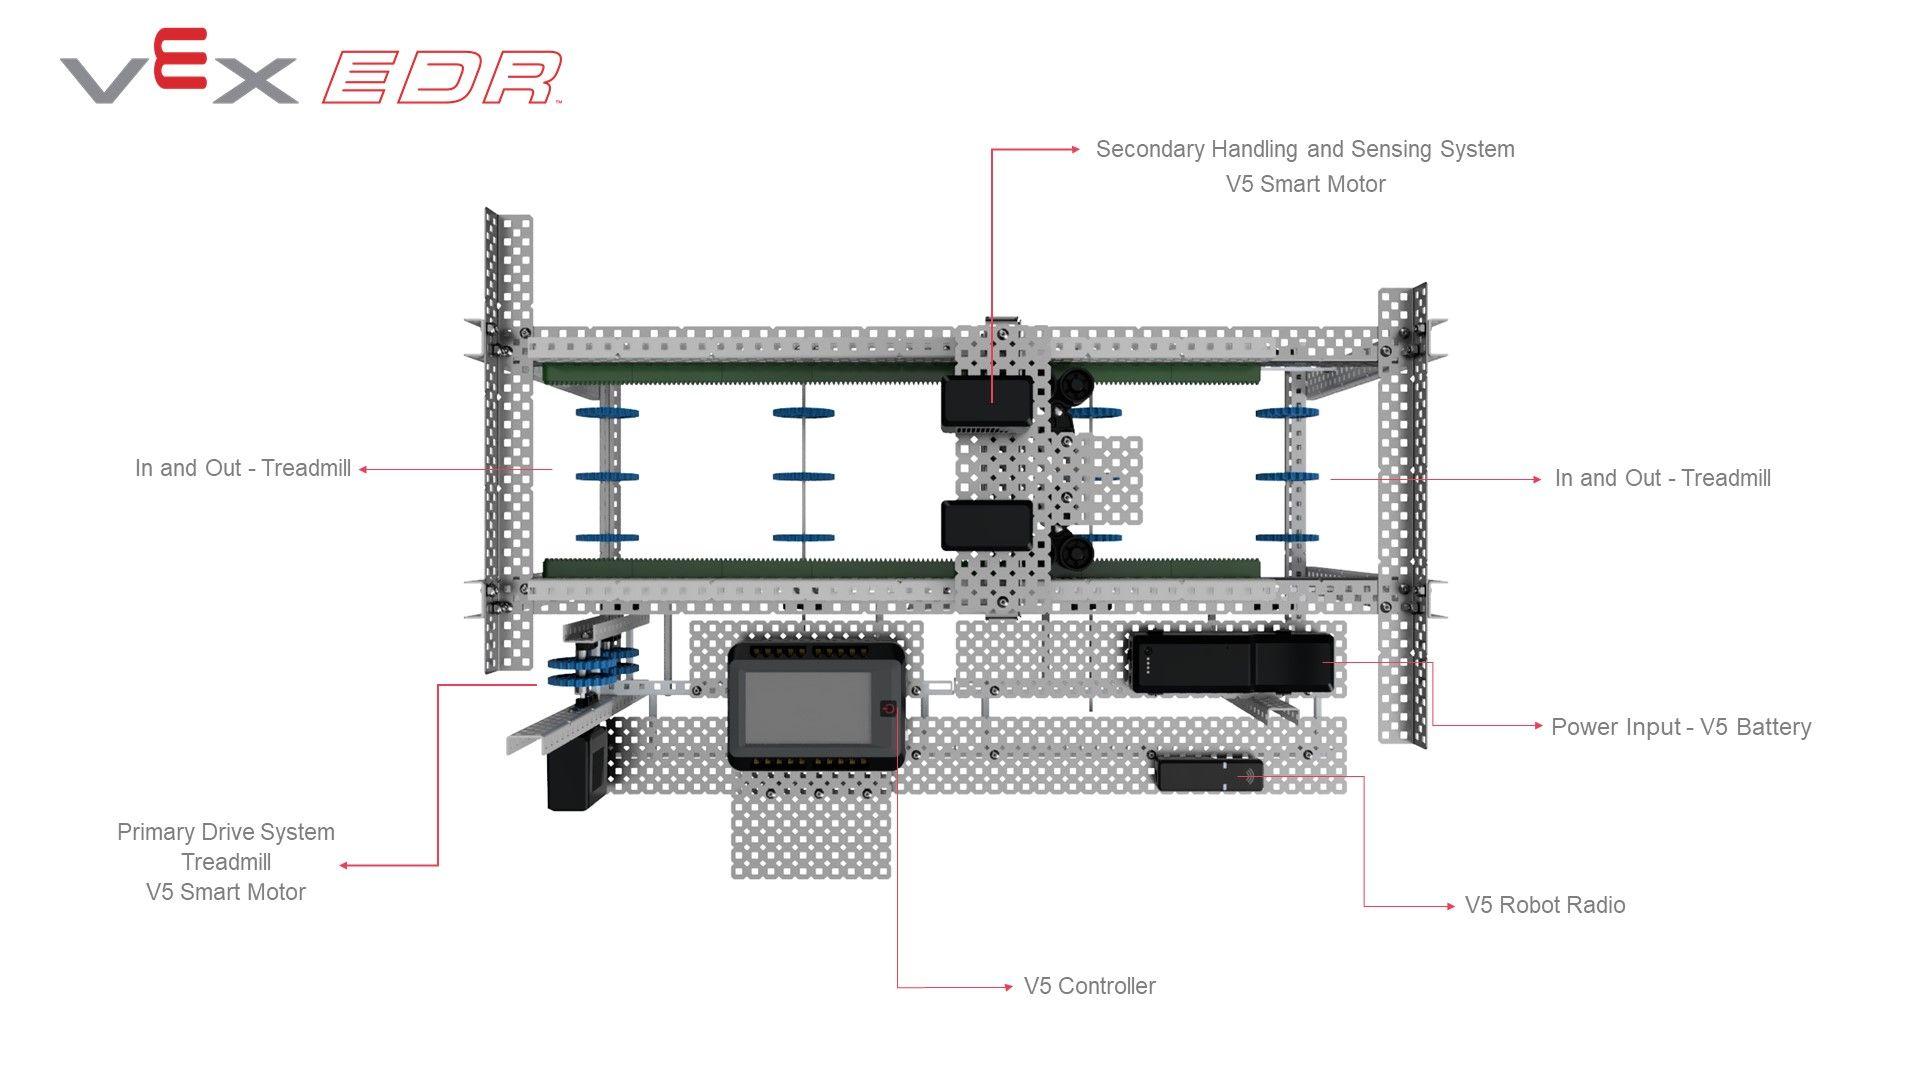 V5-vex-robotics-projeto-lcs---fabrica-de-nerdes-syst-3500-3500